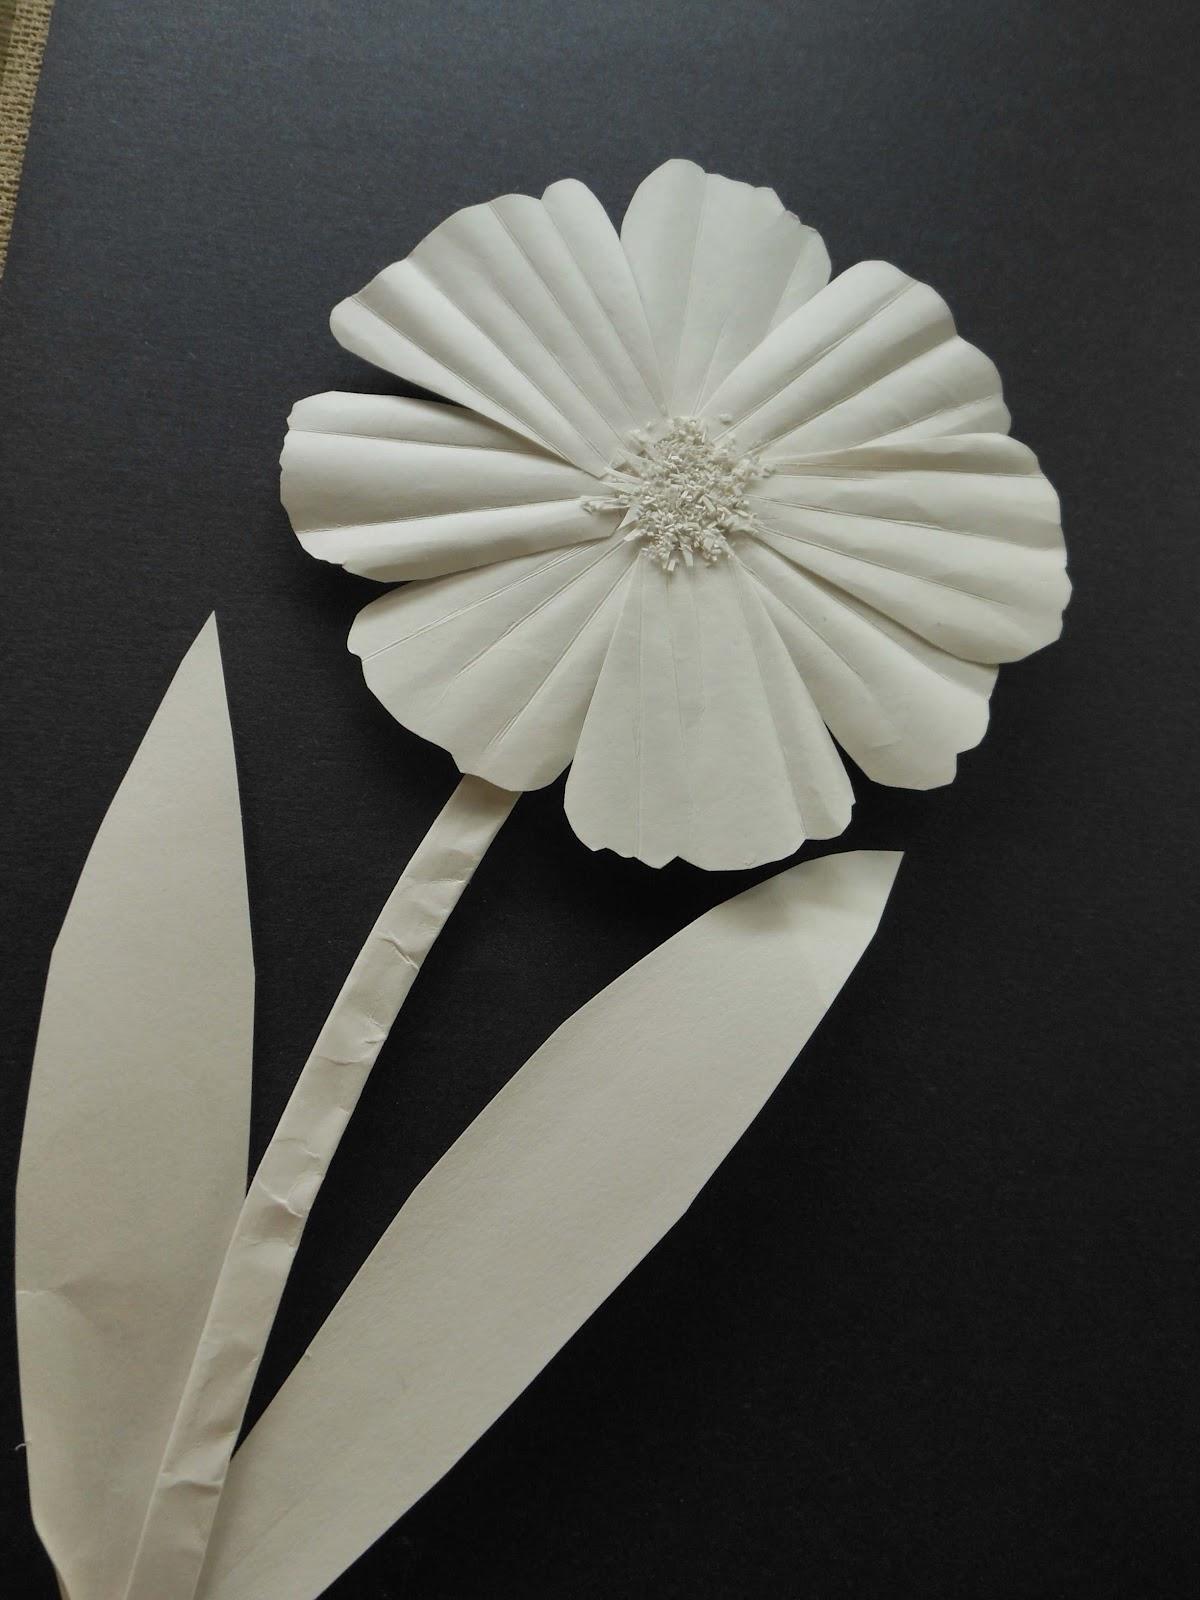 Negativespace White Paper Sculpture